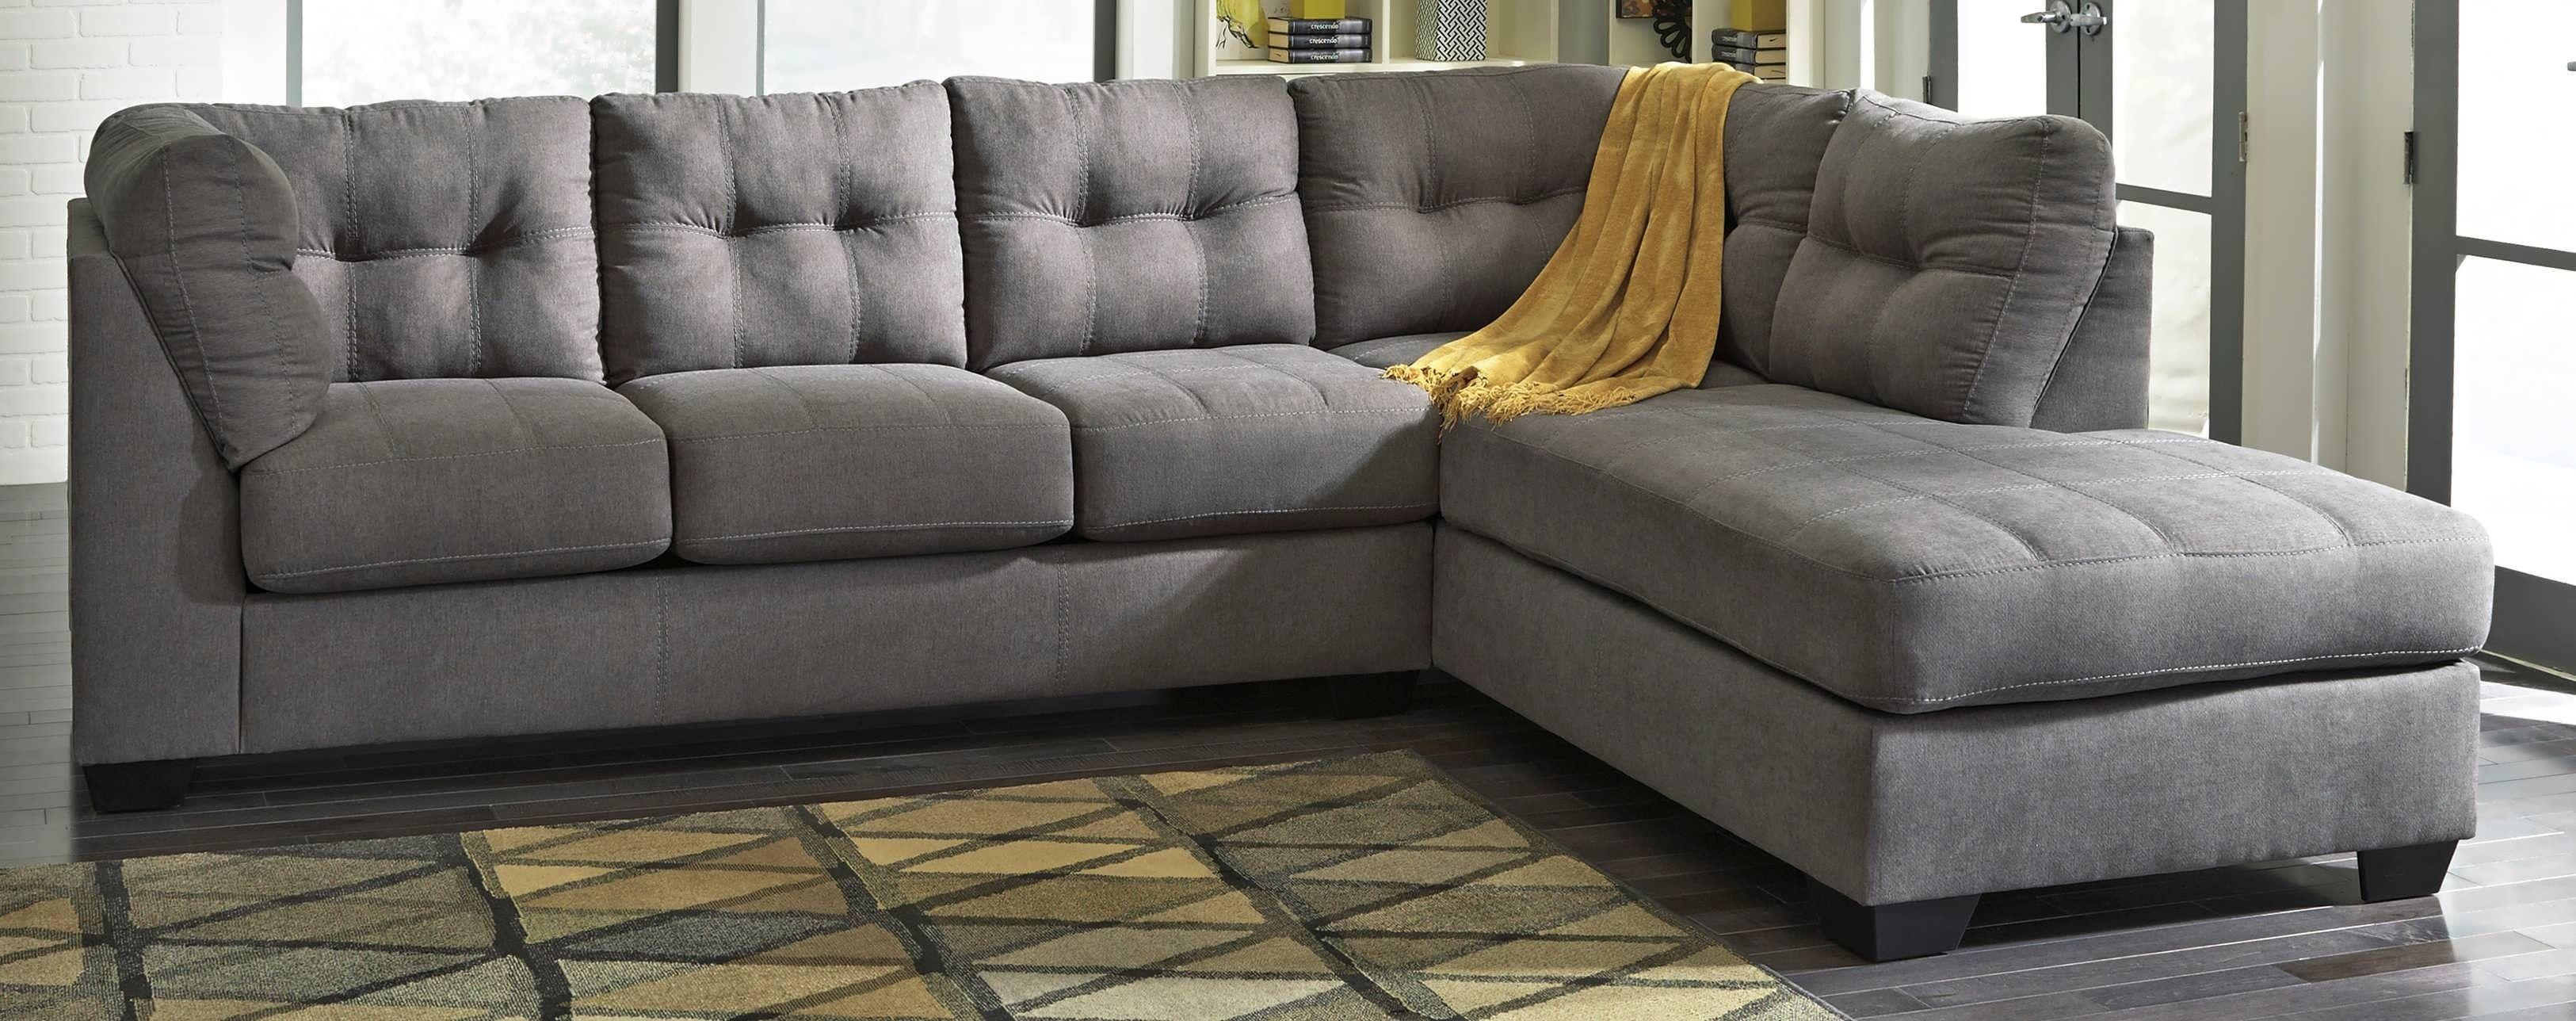 modular sofa leder sofa ubergrossen sofas und sectionals microfiber sectional sofa schnitt couch mit liege